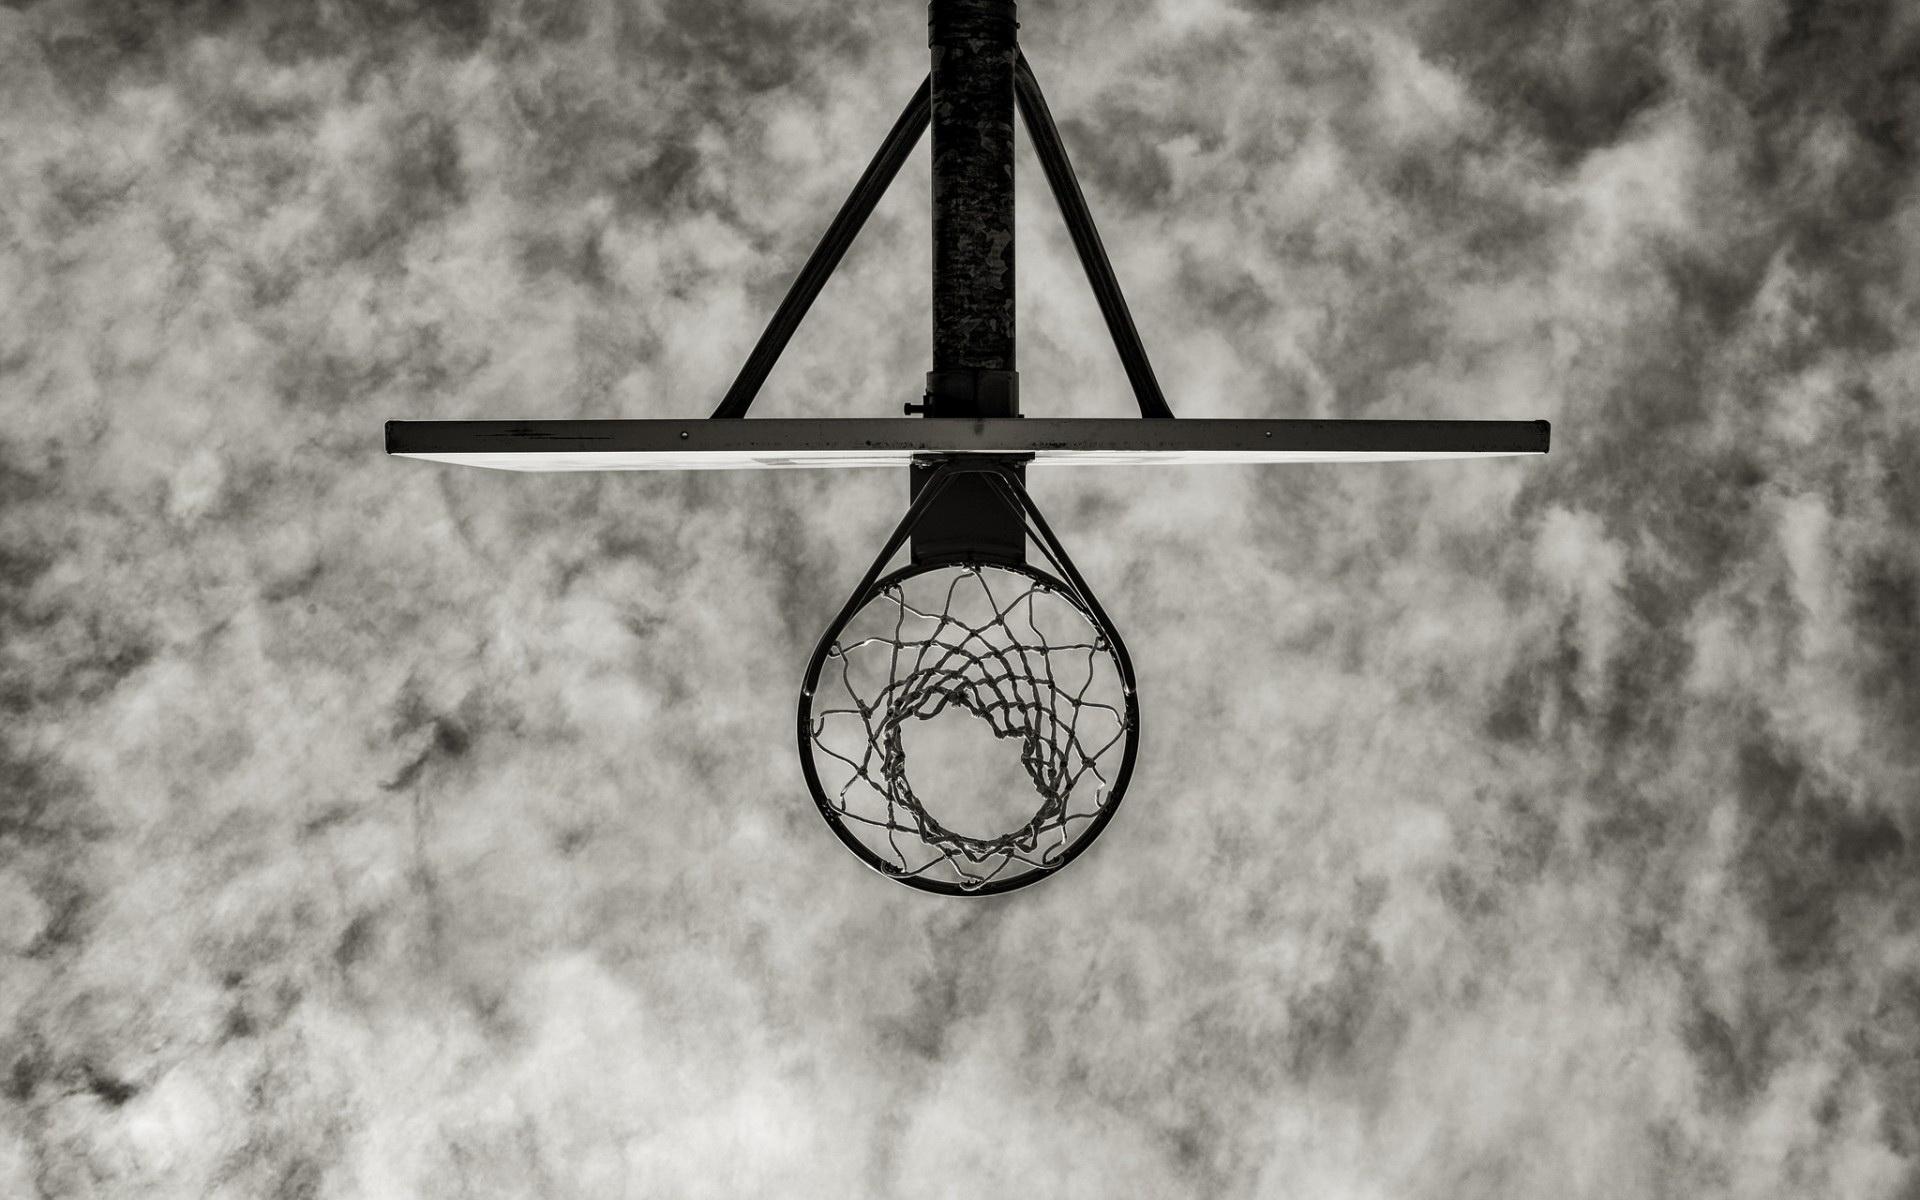 Basketball Hd Wallpaper Background Image 1920x1200 Id 524407